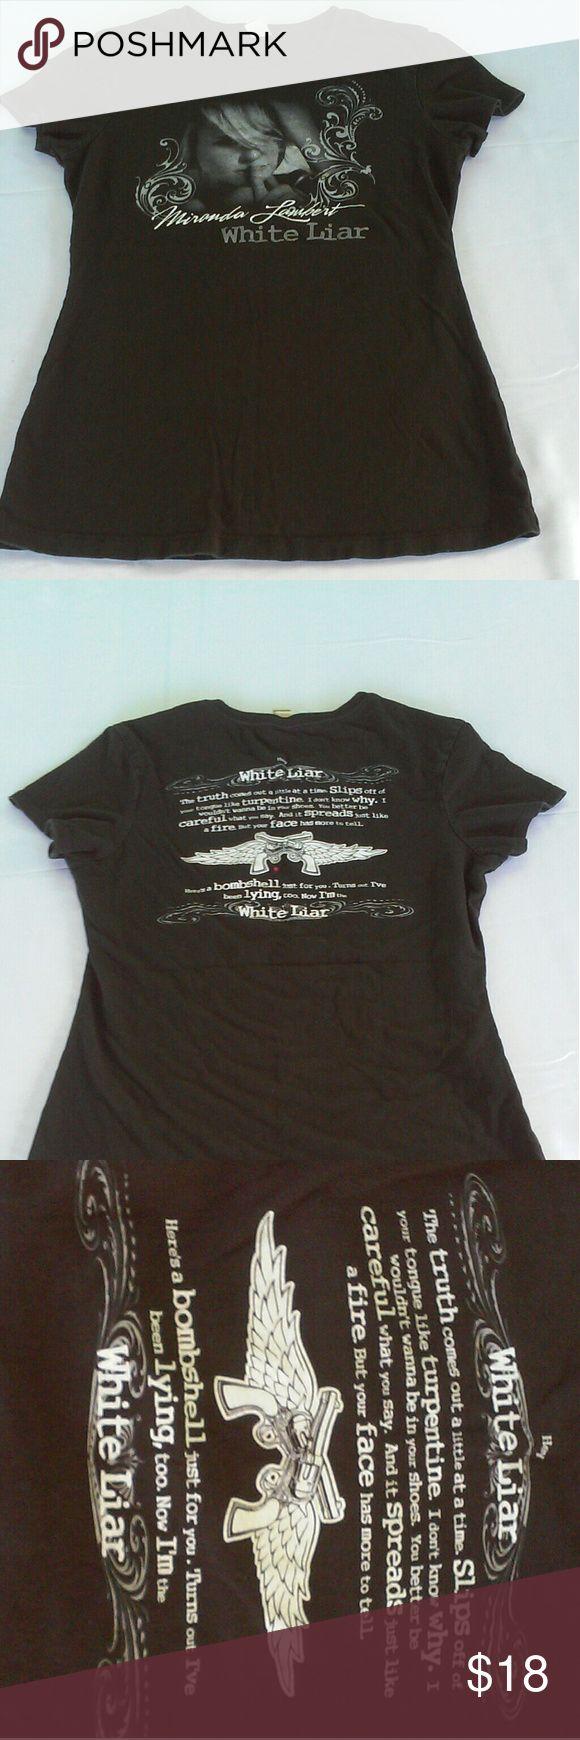 Best 25 miranda lambert white liar ideas on pinterest miranda miranda lambert white liar shirt hexwebz Gallery